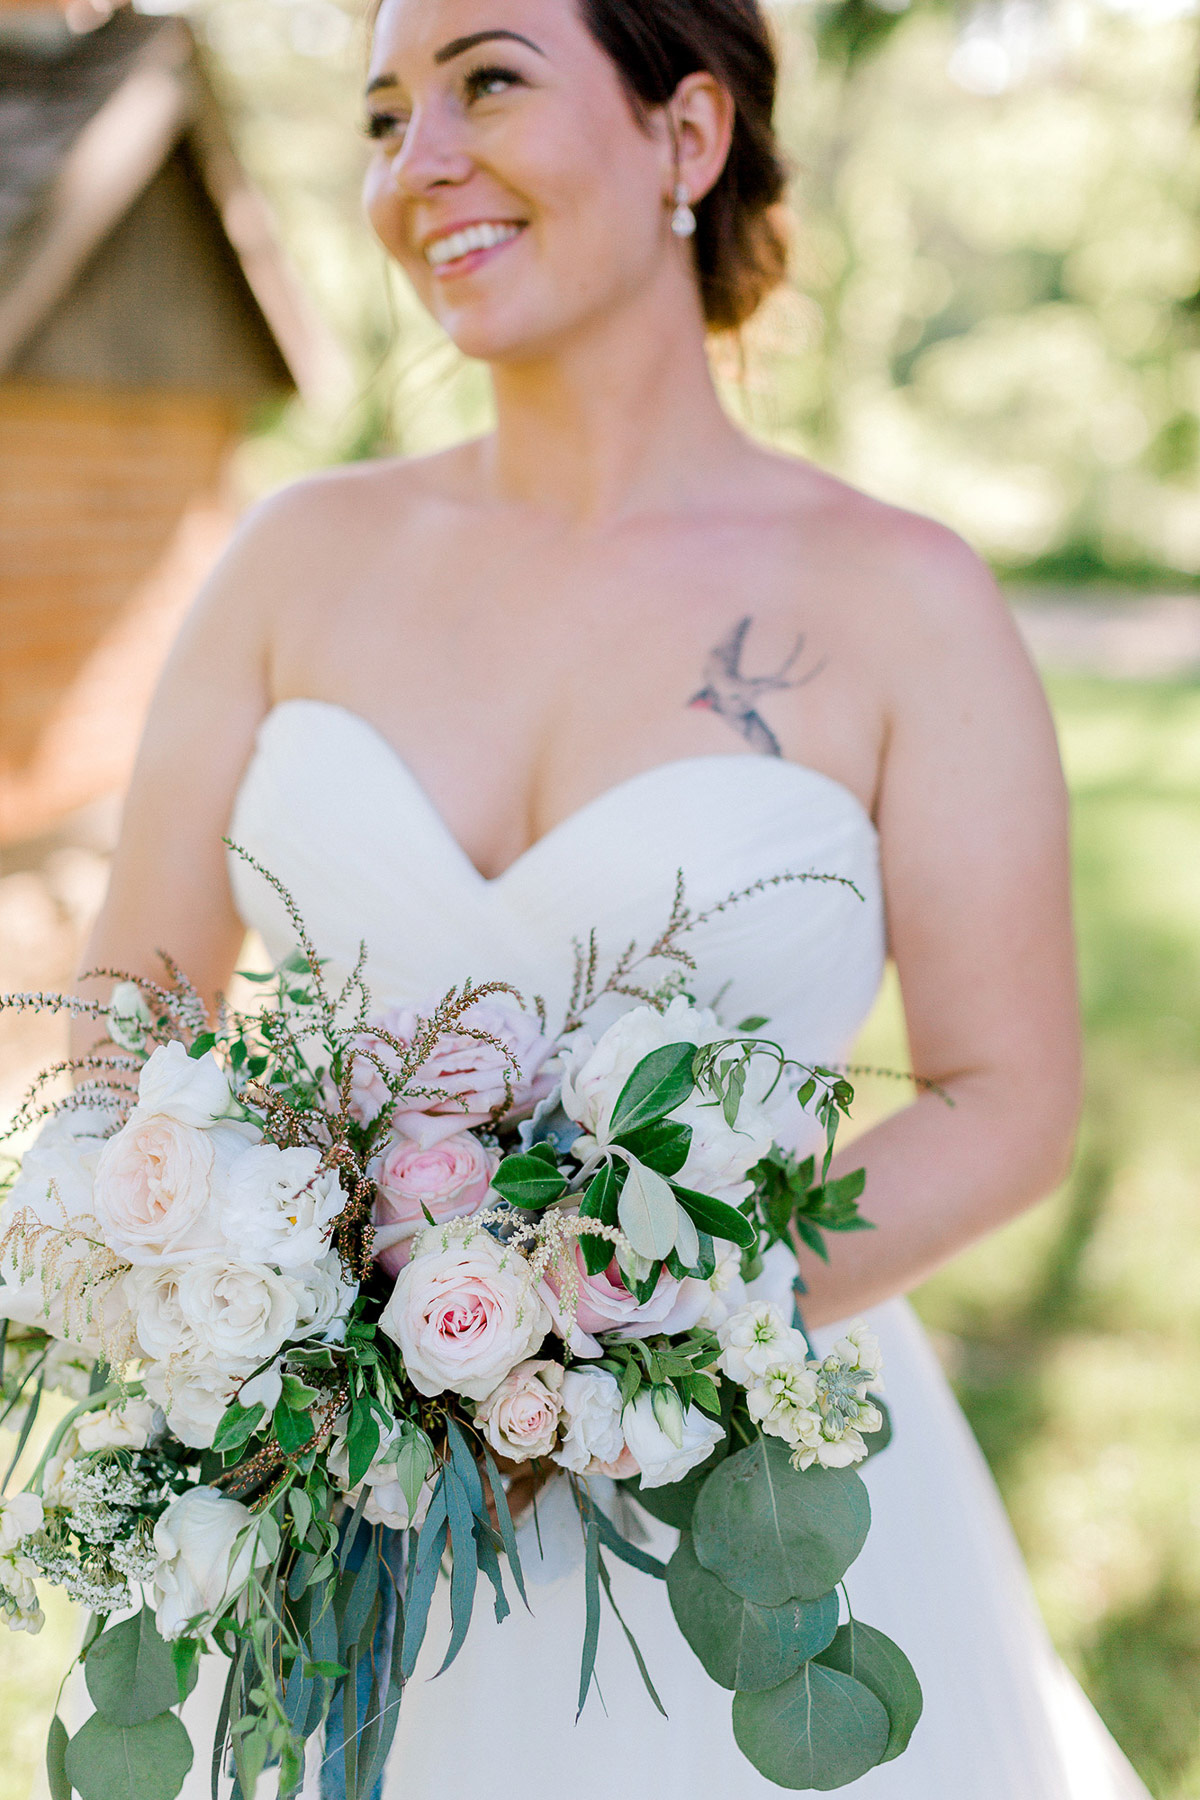 beatrice-elford-photography-vineyard-bride-swish-list-balls-falls-vineland-wedding-32.jpg